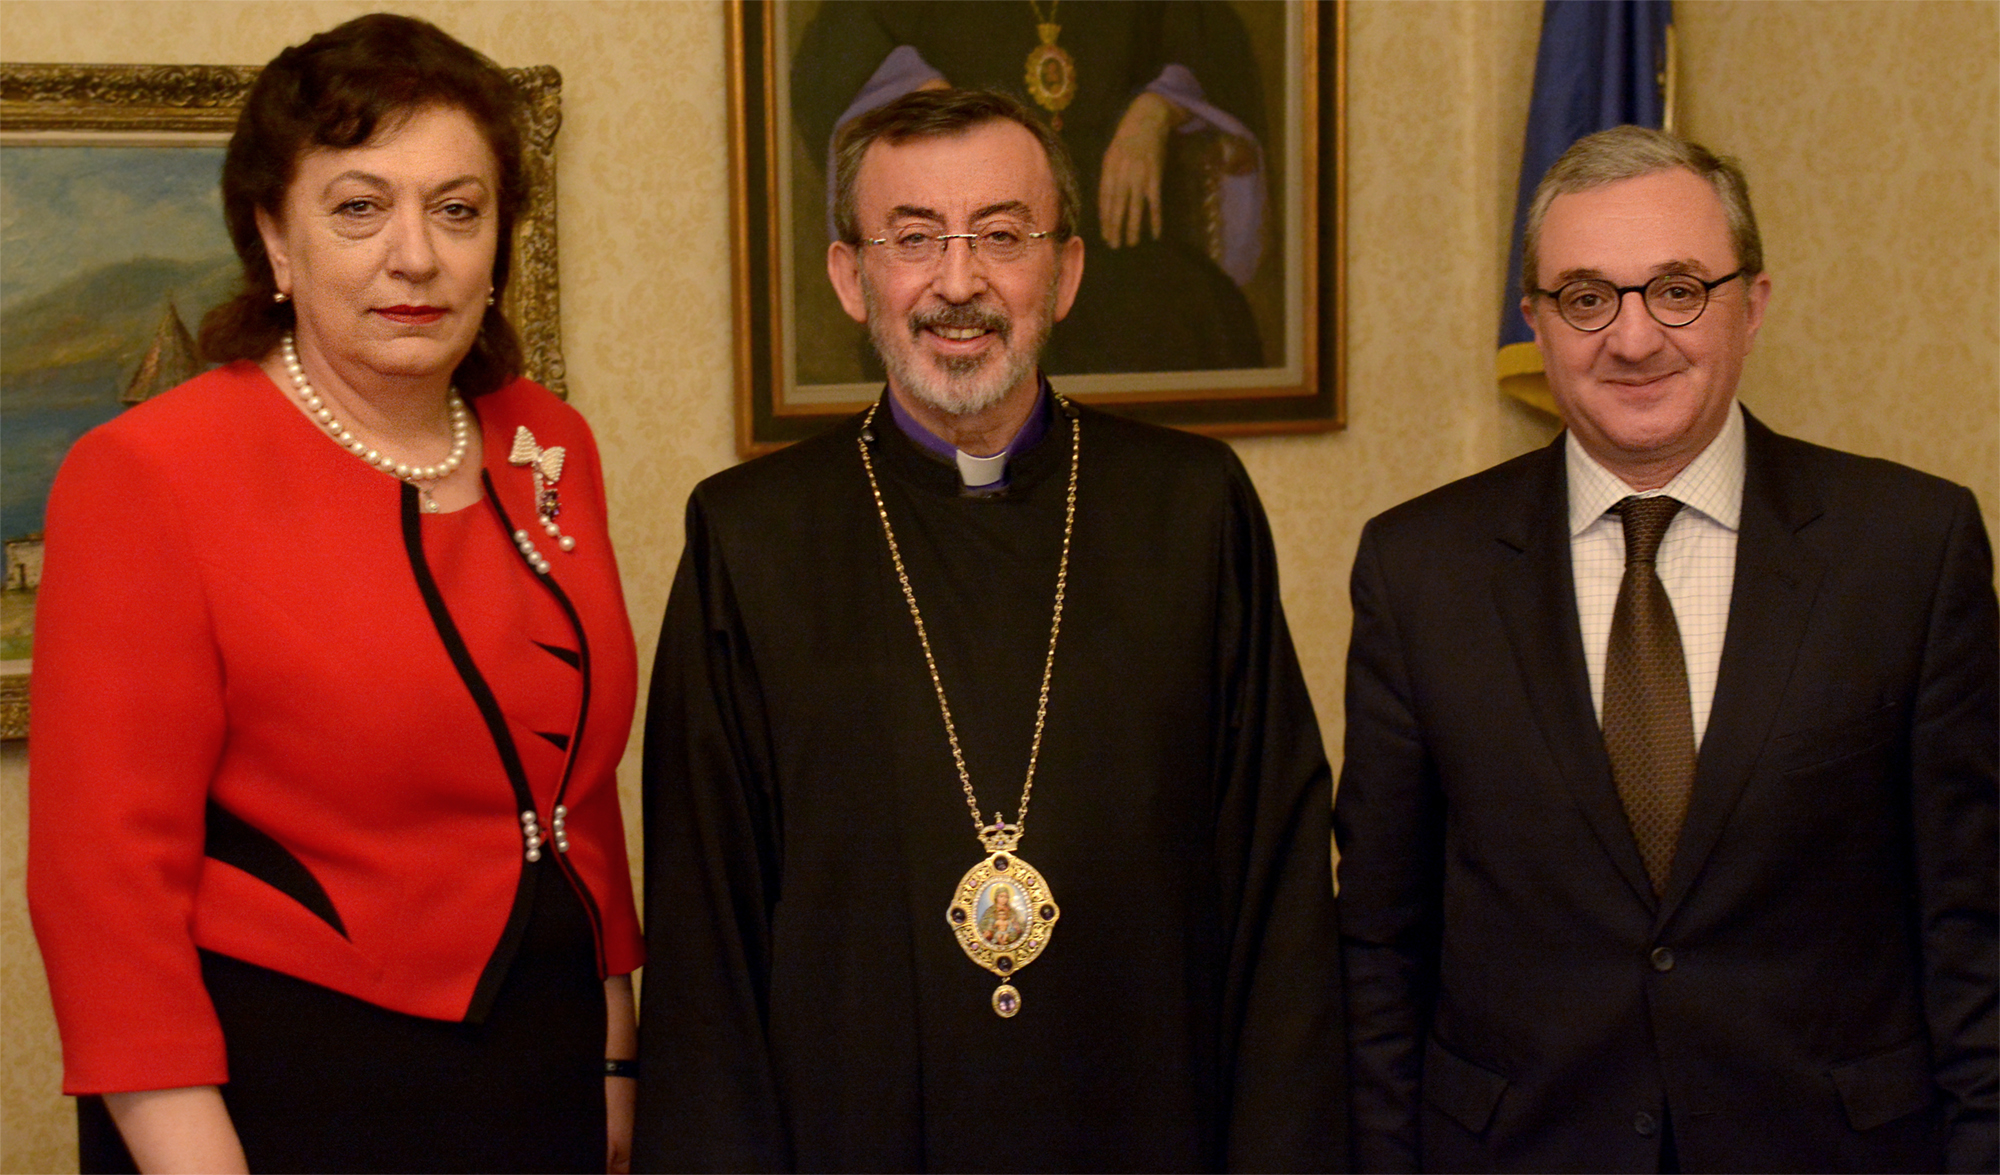 Hranush Hakobyan Visits Diocesan Center